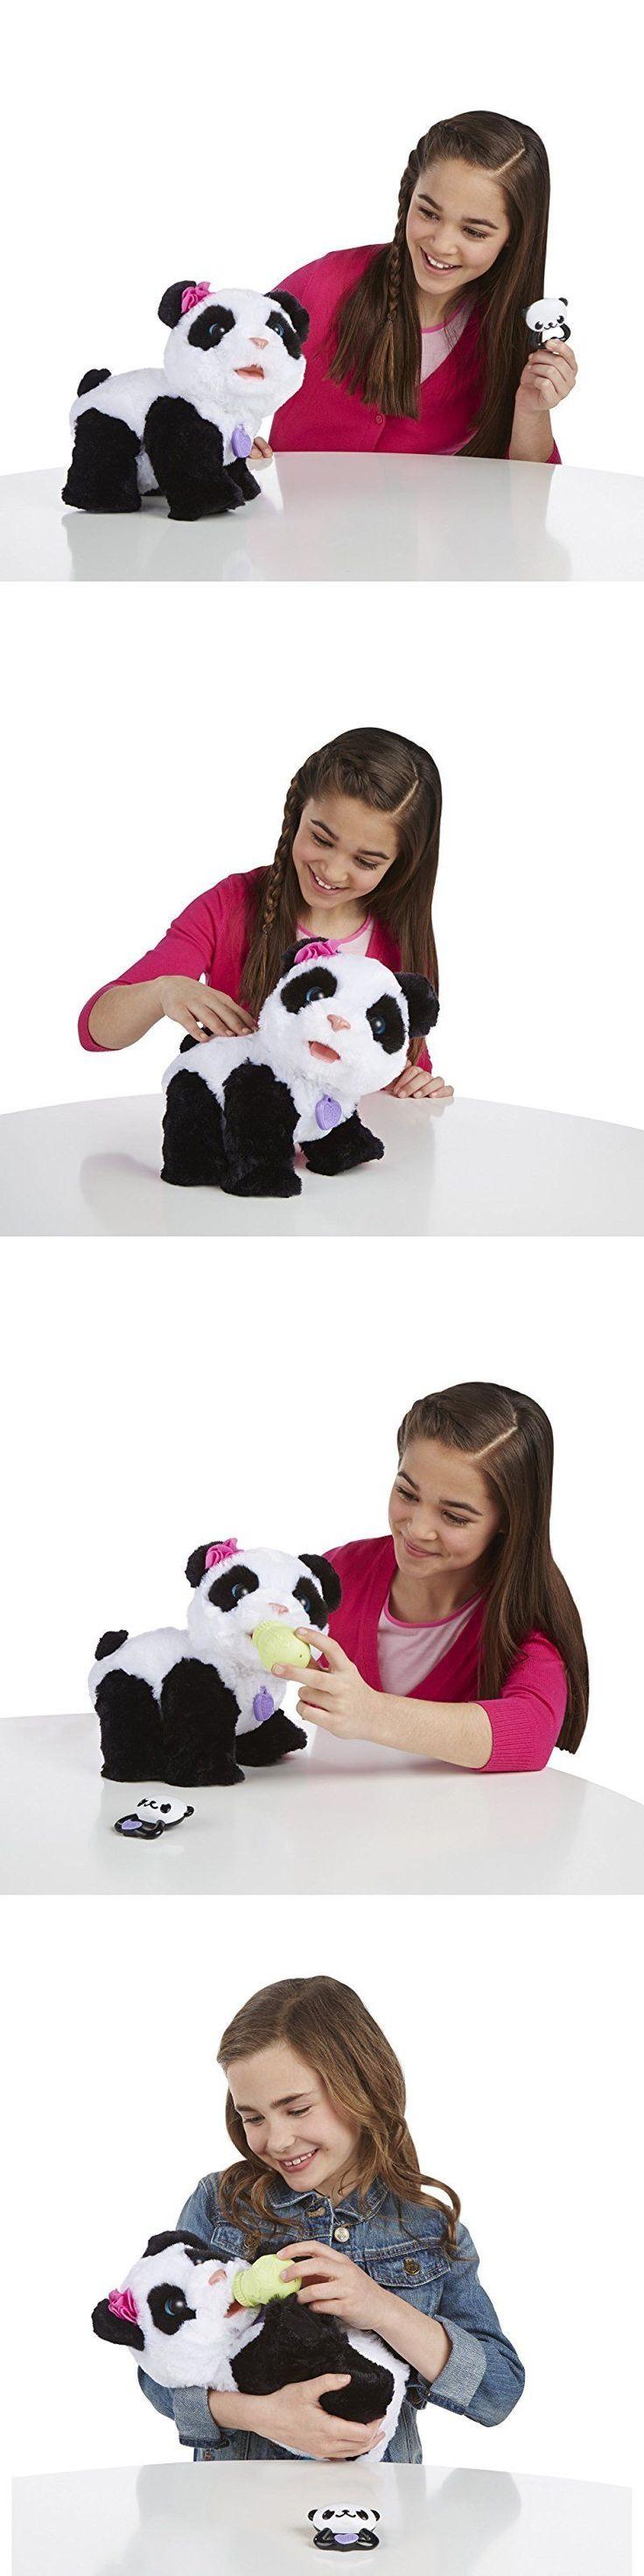 FurReal Friends 38288: Furreal Friends Pom Pom My Baby Panda Pet -> BUY IT NOW ONLY: $69.85 on eBay!